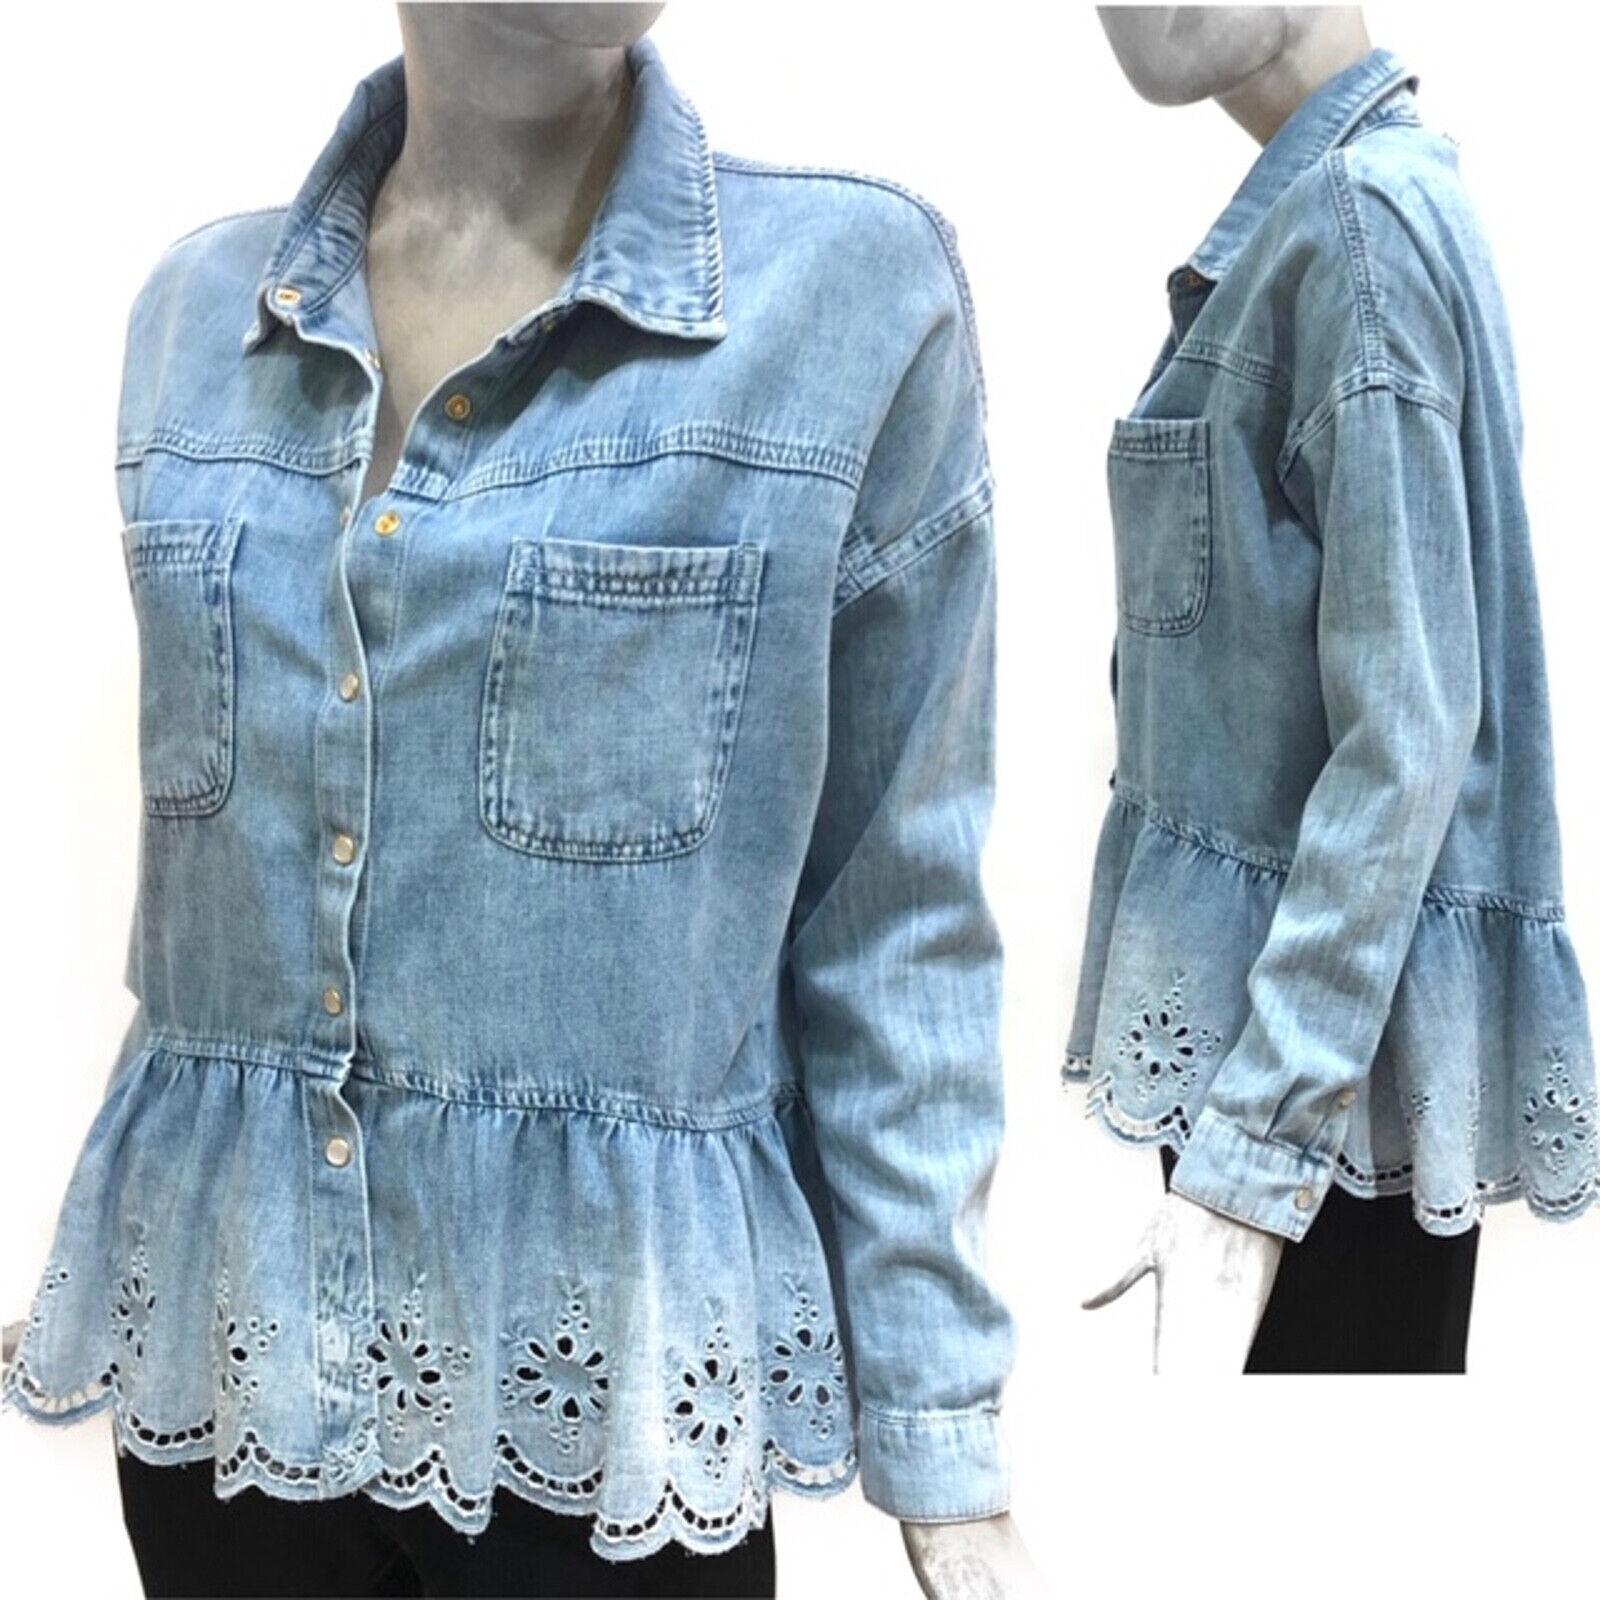 Mytwin Twinset Camicia Blau Denim Shirt Modello Over Manica Lunga T-shirt Maglia